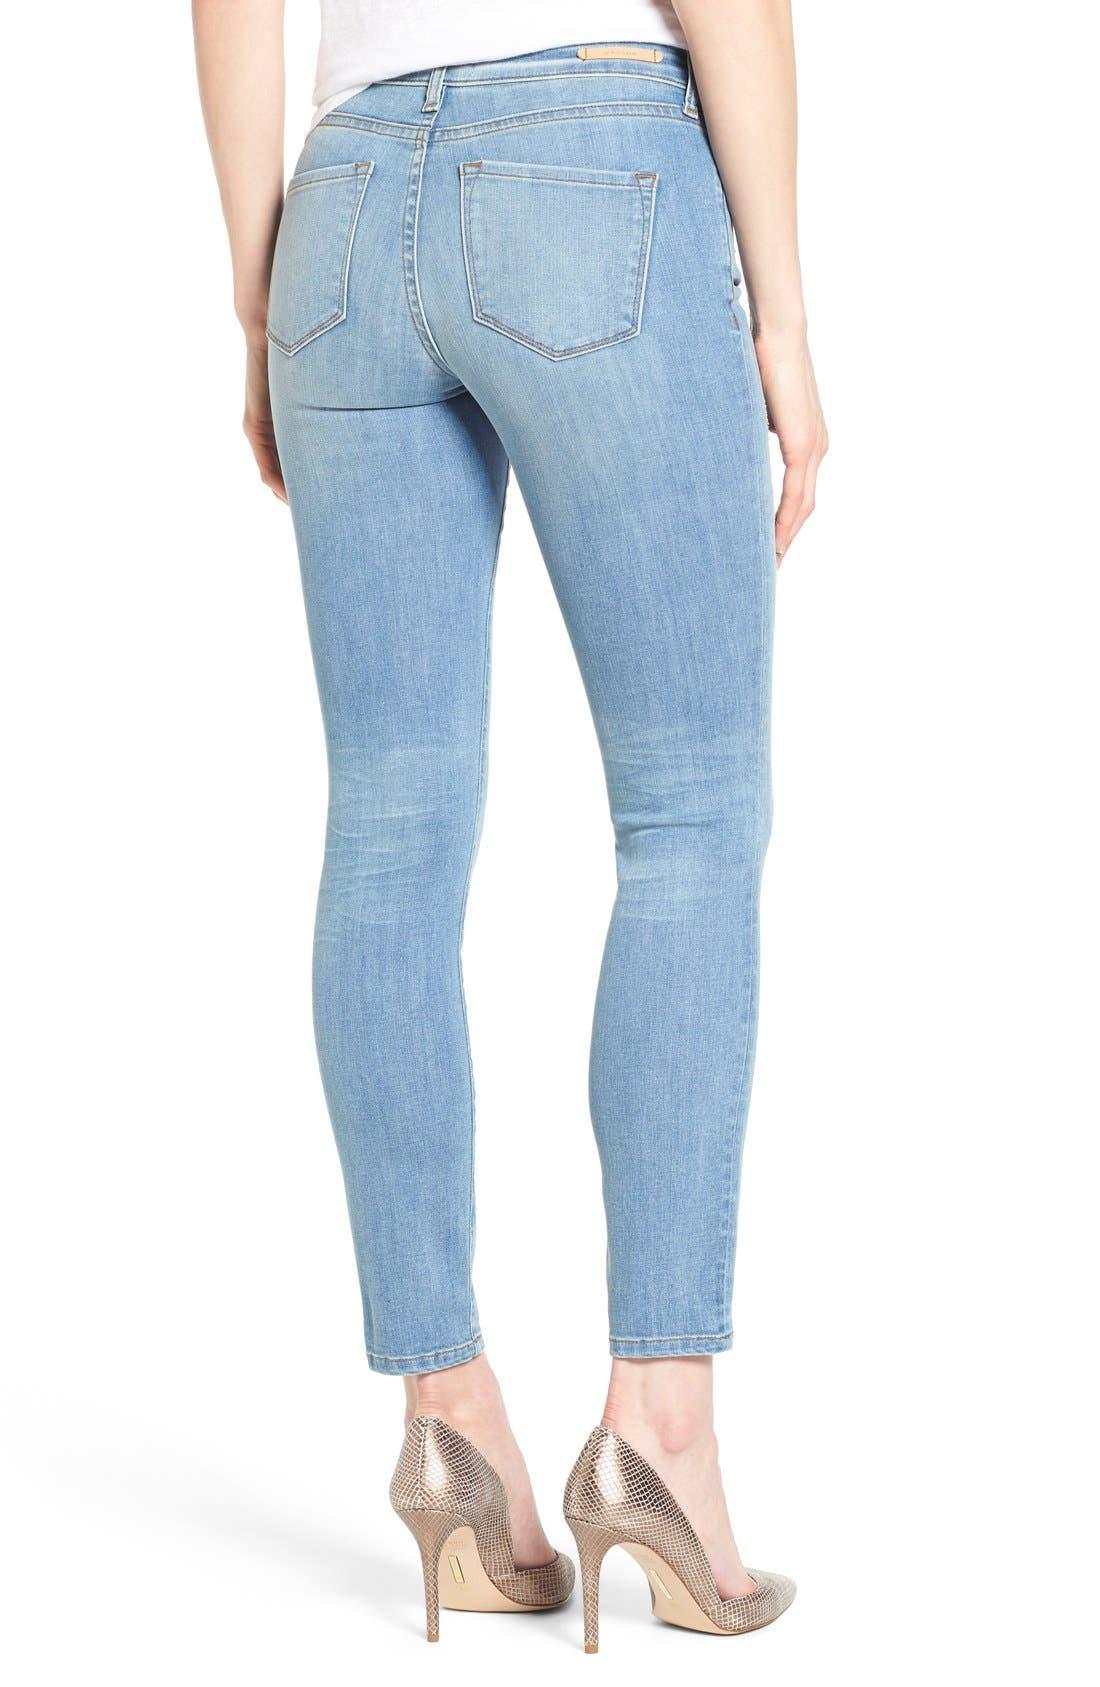 Alternate Image 2  - Mavi Jeans 'Adriana' Distressed Stretch Skinny Ankle Jeans